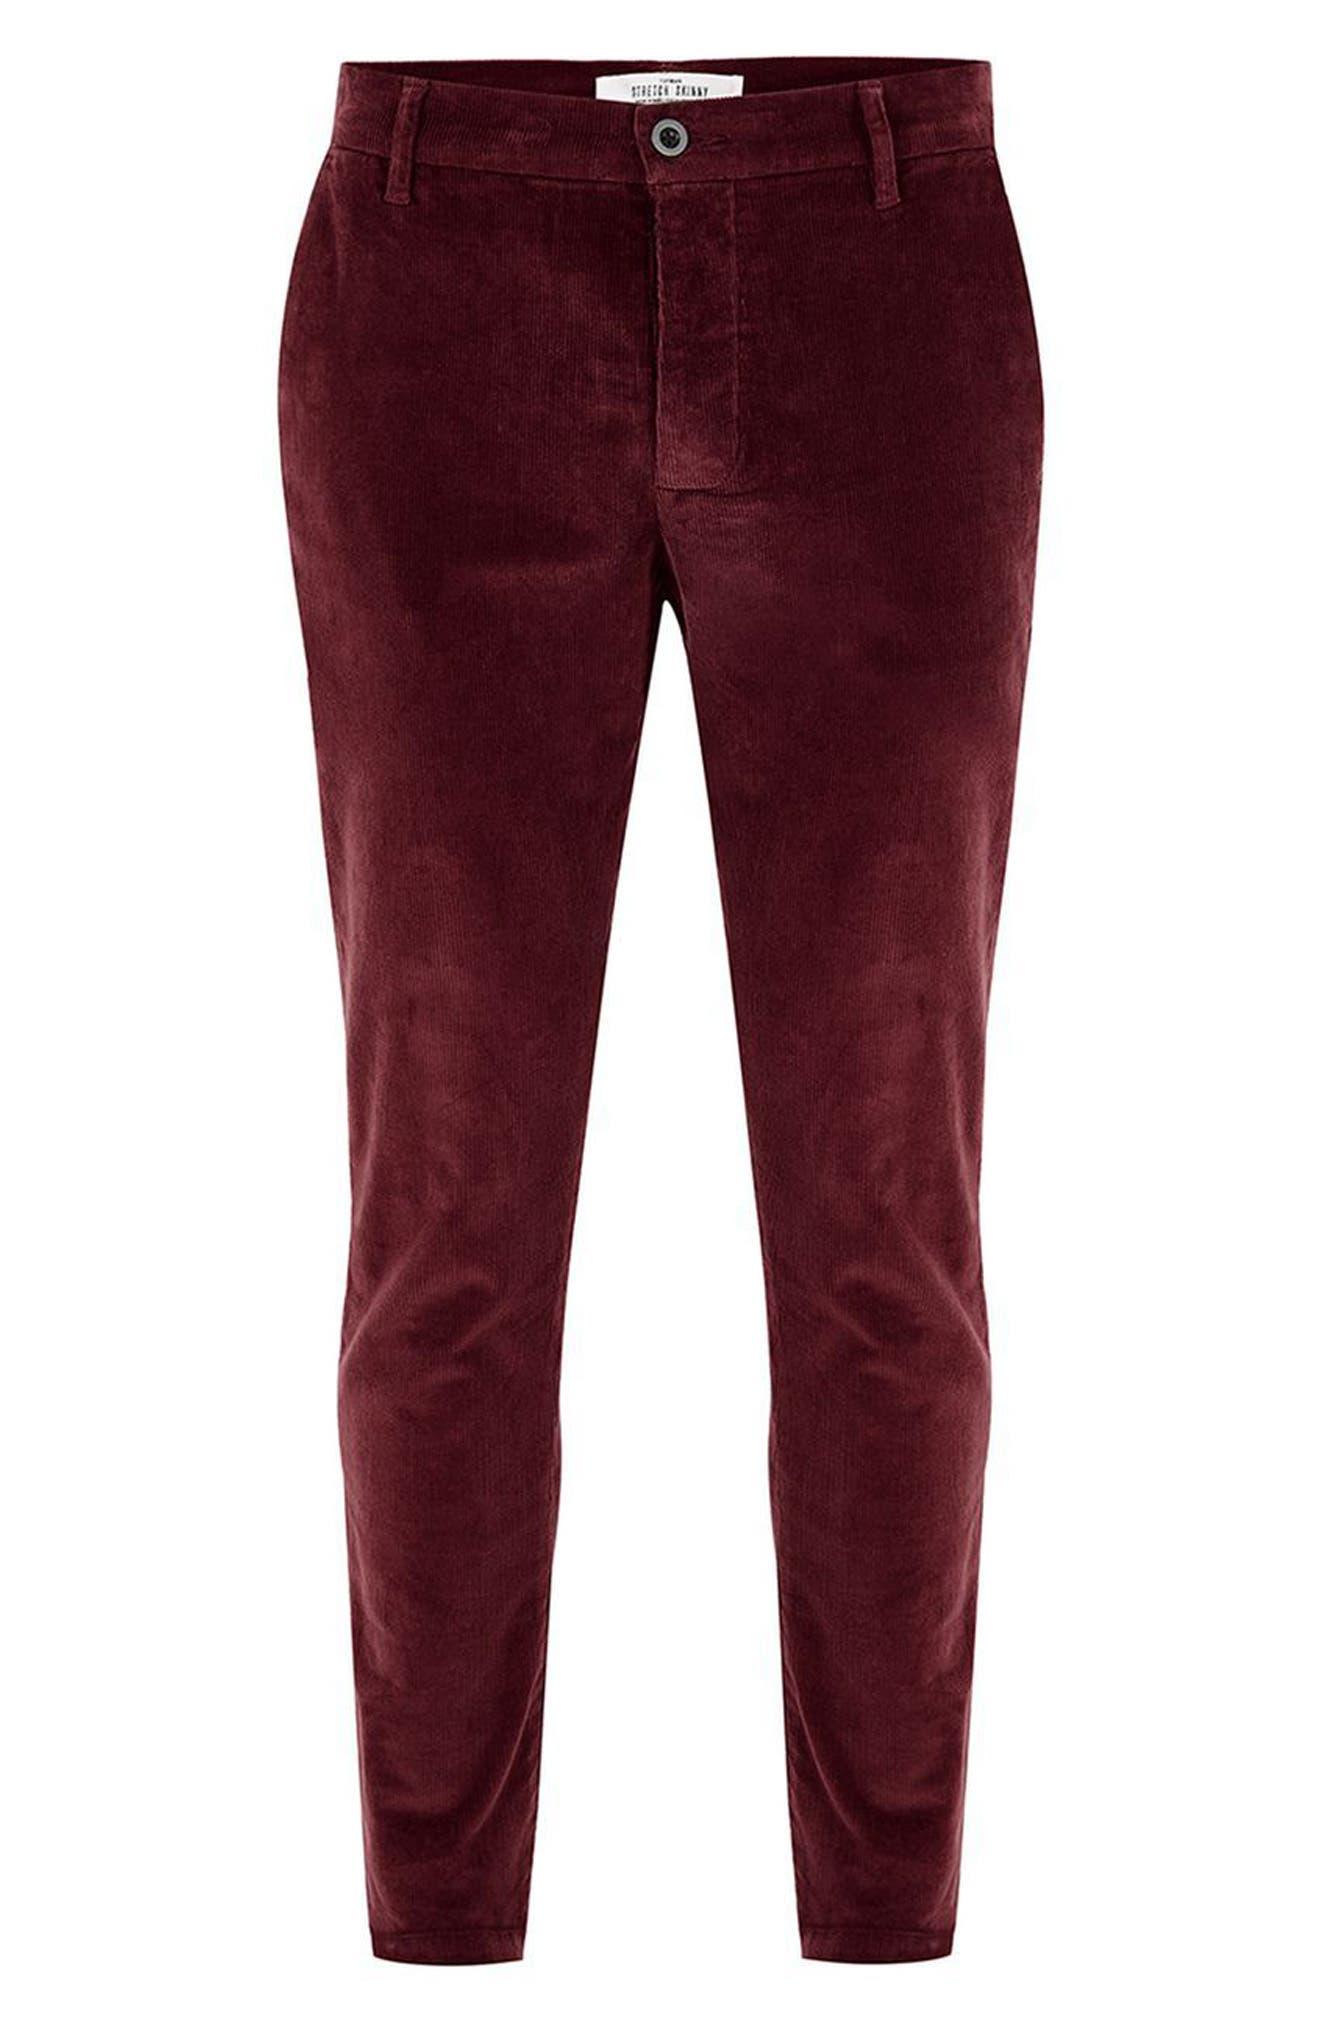 Skinny Fit Corduroy Trousers,                             Alternate thumbnail 4, color,                             Burgundy